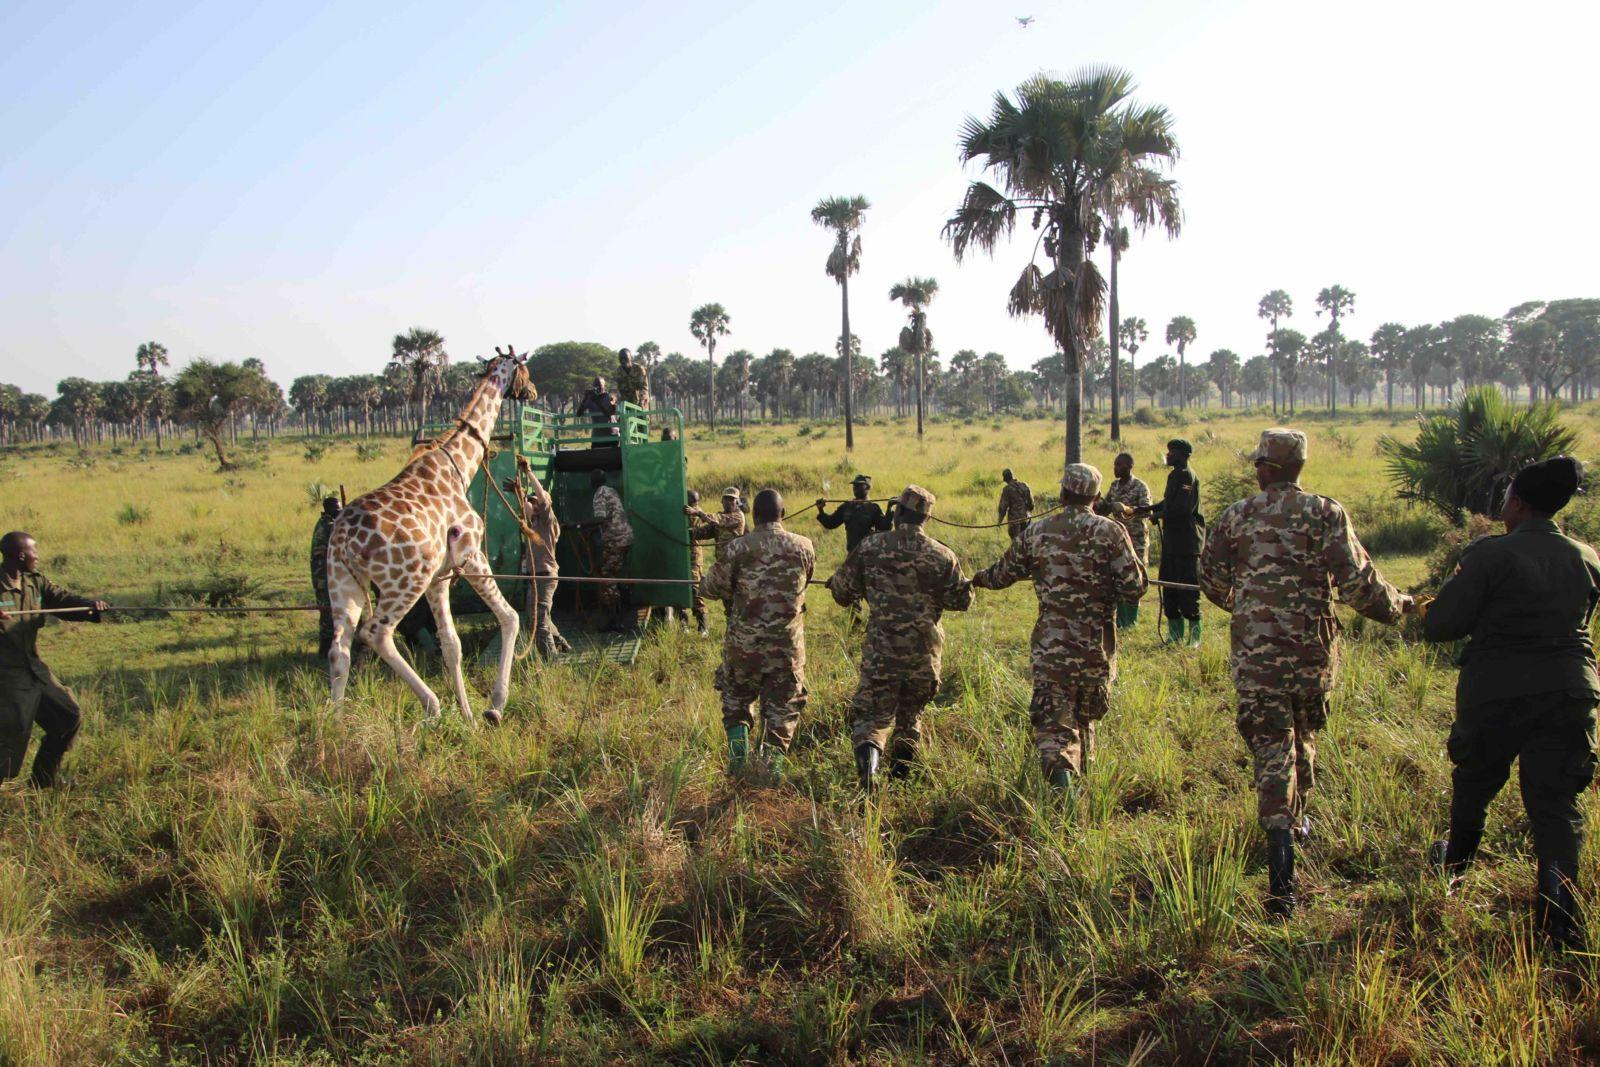 World Giraffe Day – how do you move a giraffe? Q&A with Dr Sara Ferguson from Giraffe Conservation Foundation